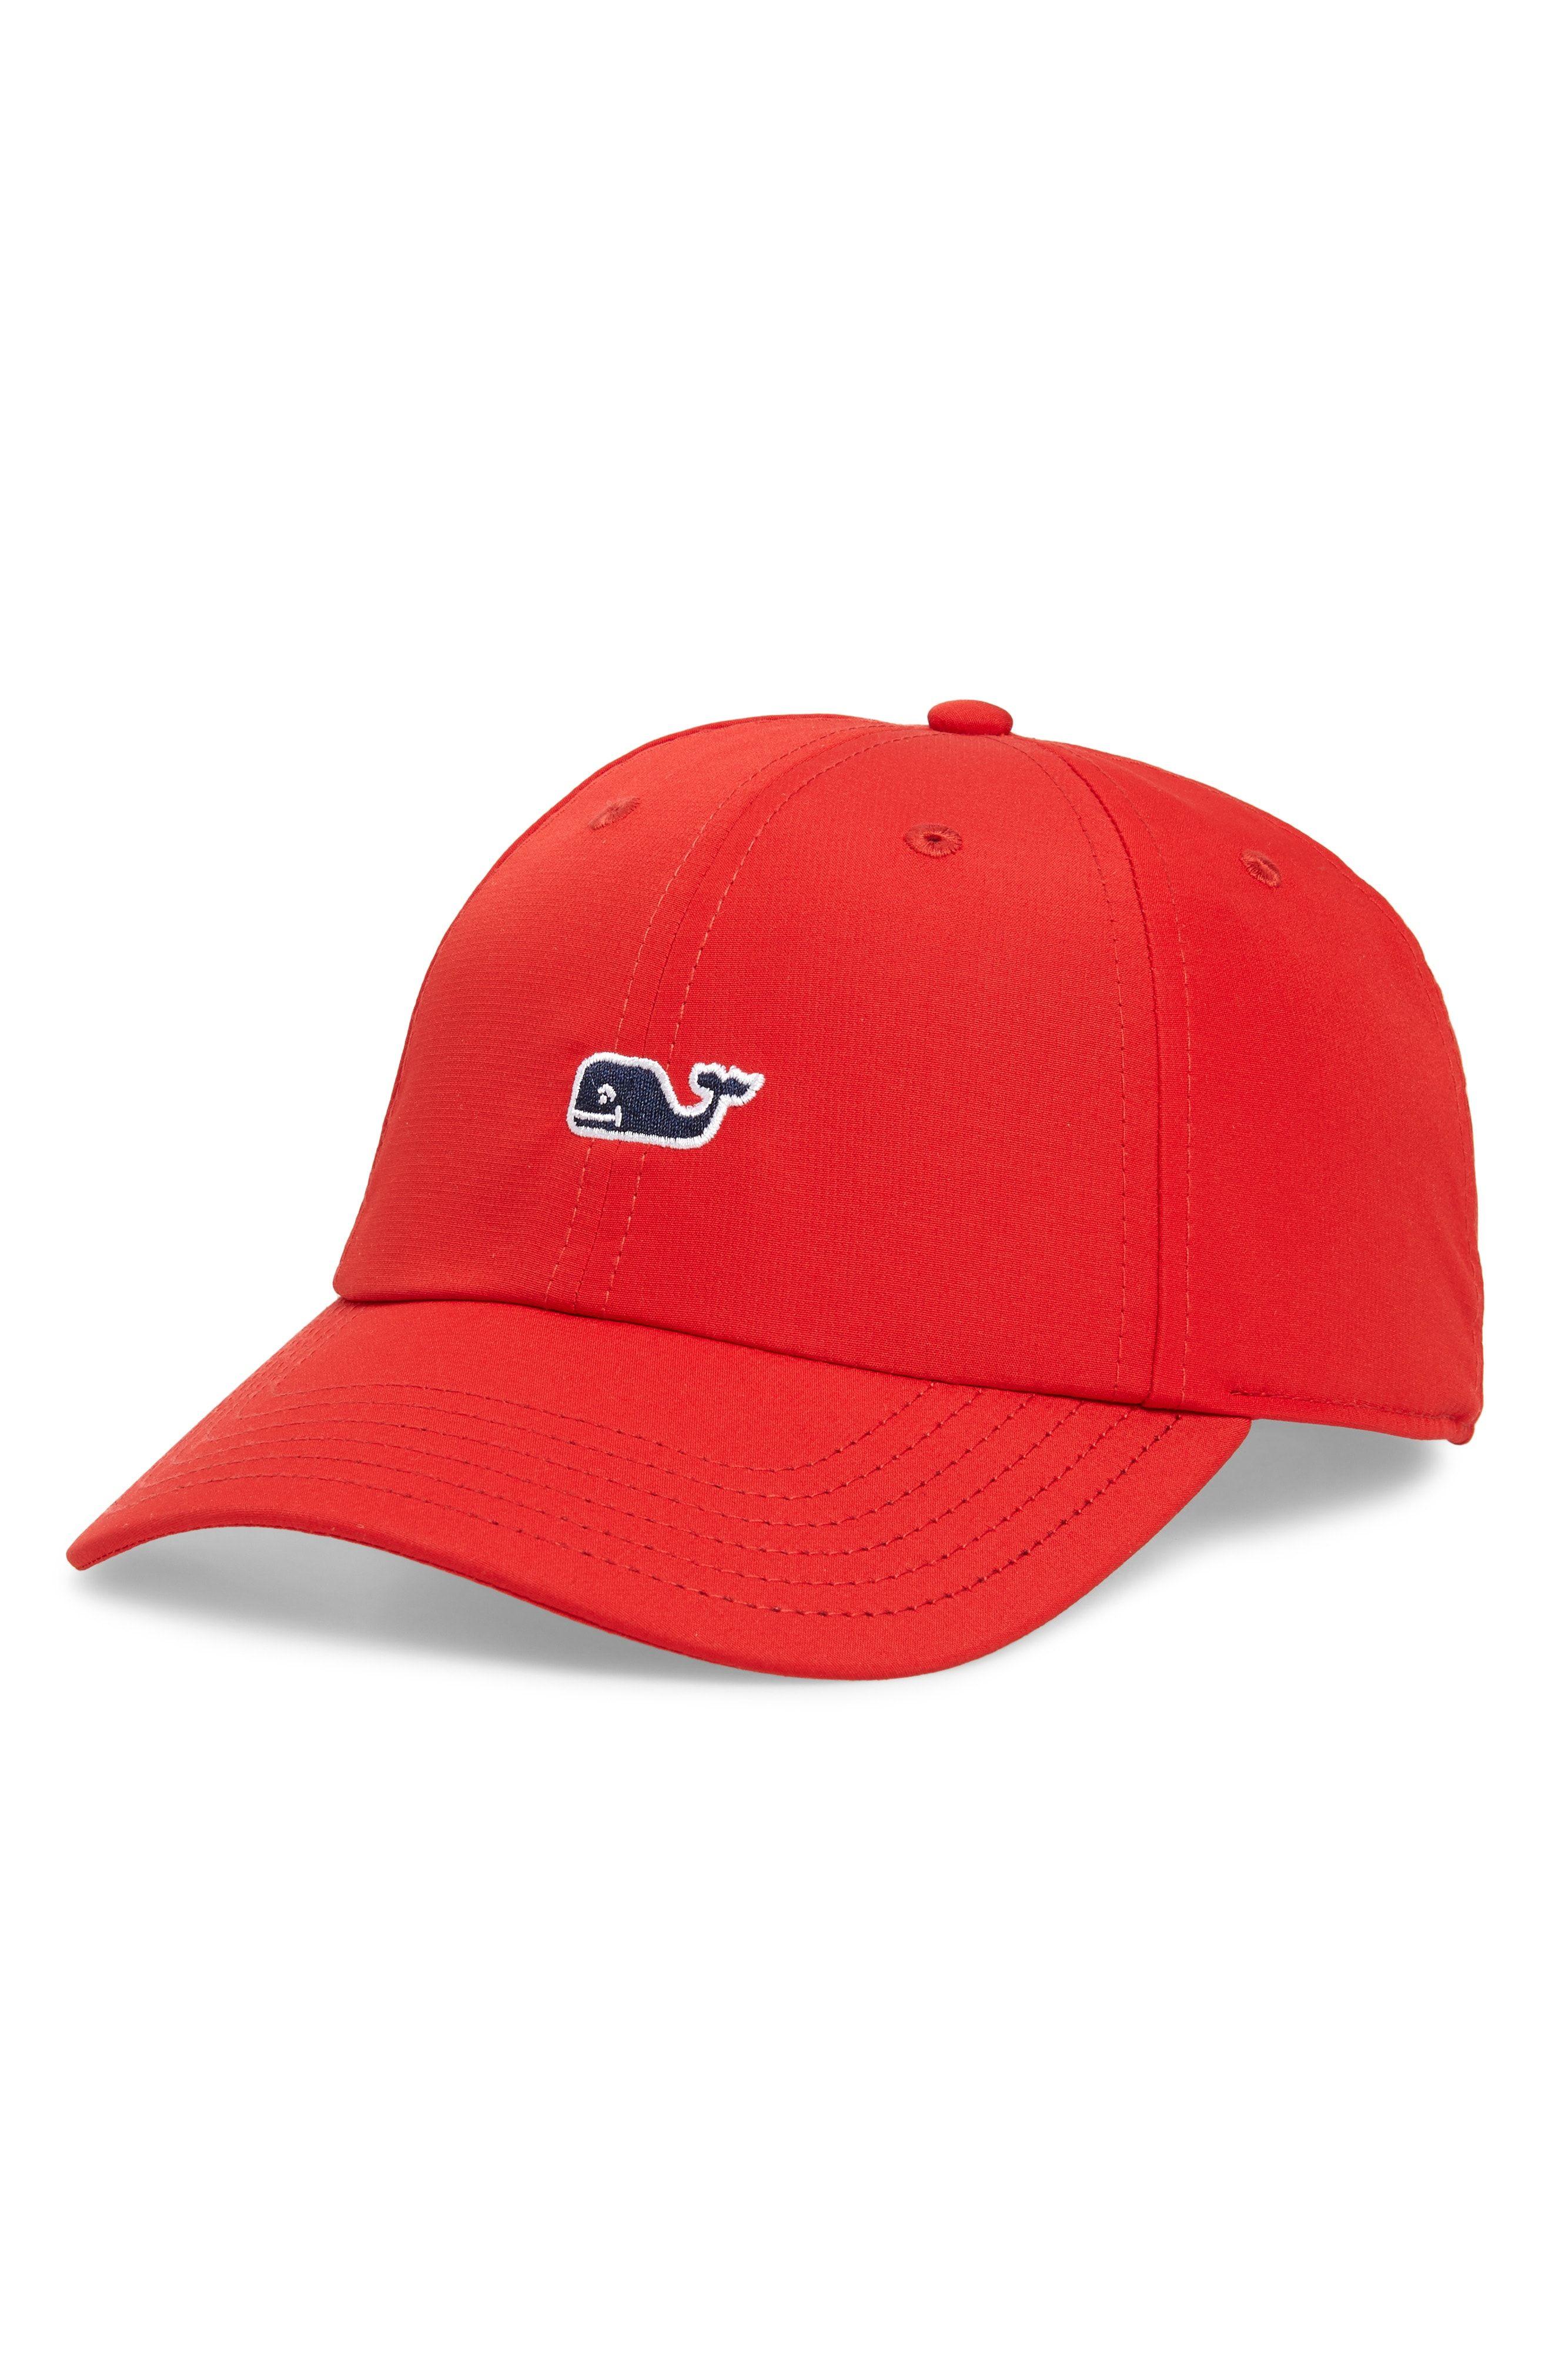 bc30b691 VINEYARD VINES WHALE LOGO BASEBALL CAP - RED. #vineyardvines ...